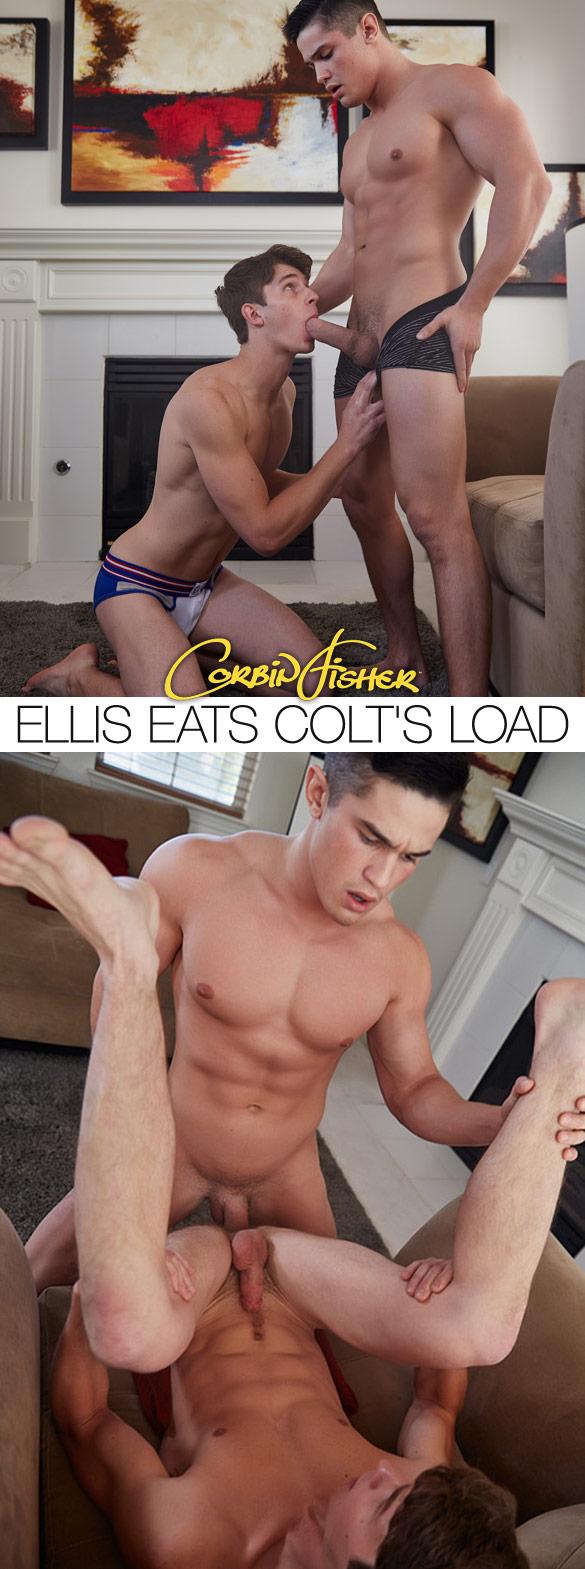 CorbinFisher – Colt fucks Ellis raw